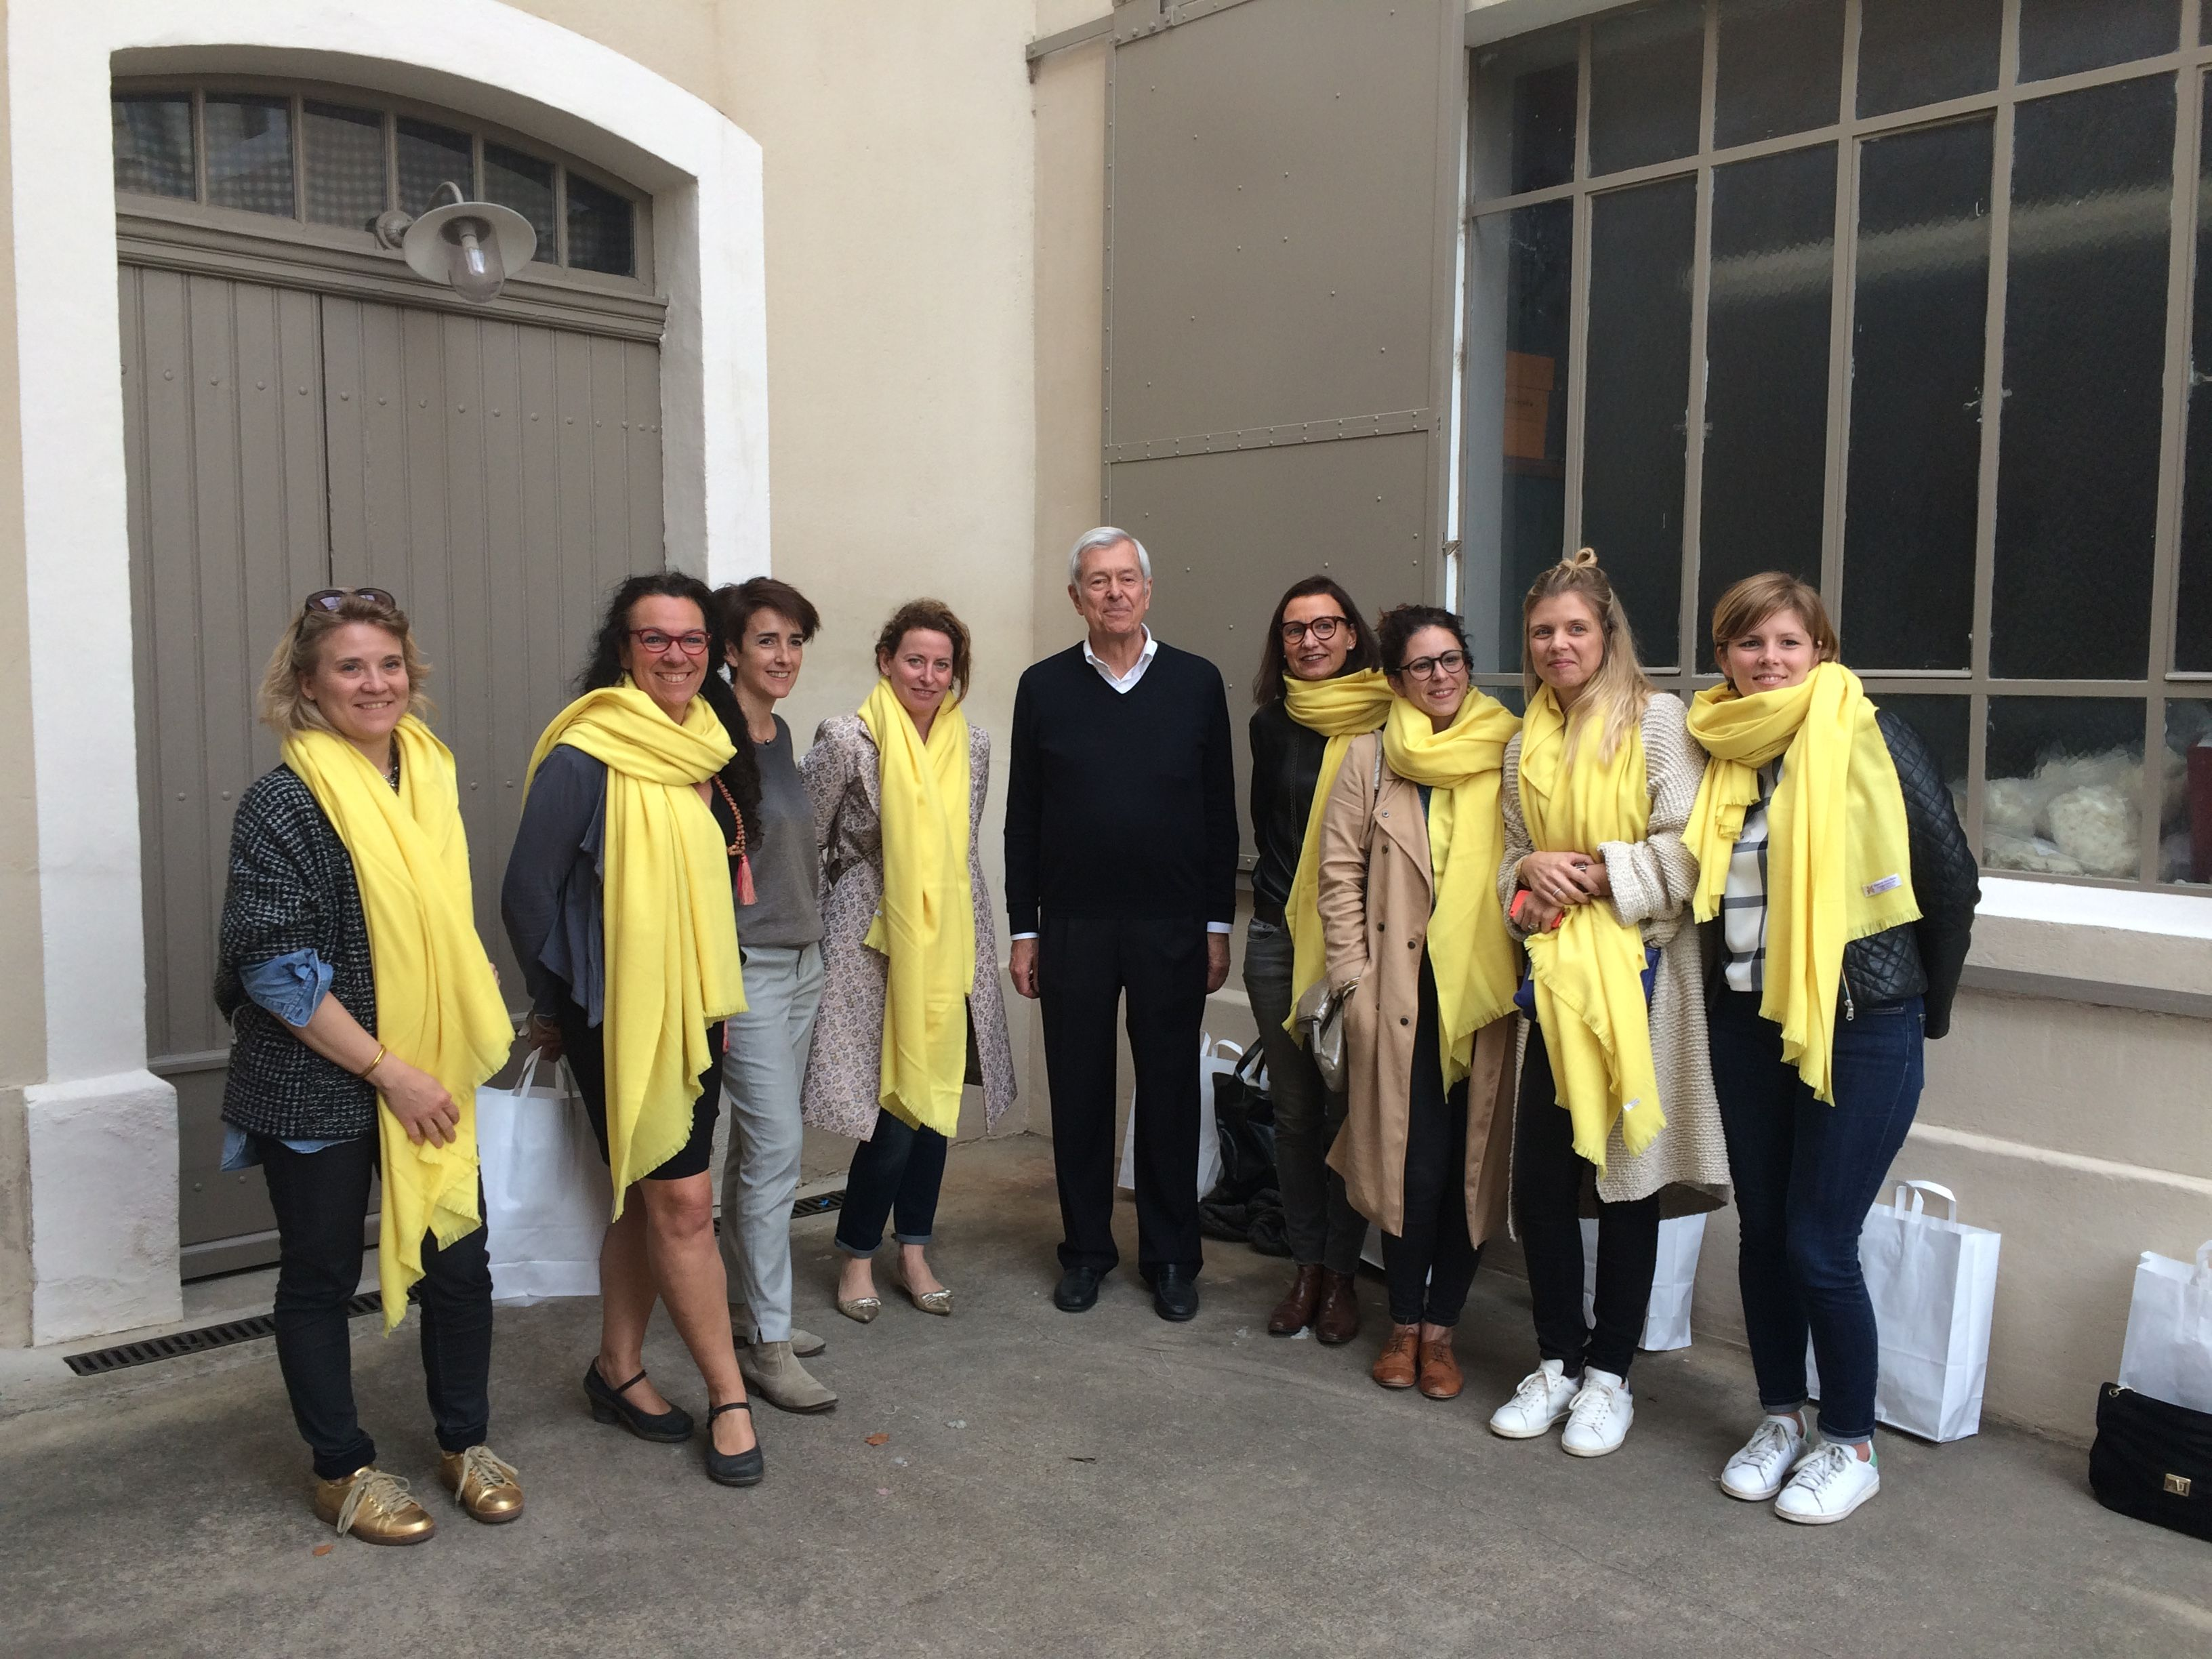 Visite de la Manufacture Brun de Vian-Tiran par les blogueuses de la Joyeuse  Clique. f0ebabdadf9